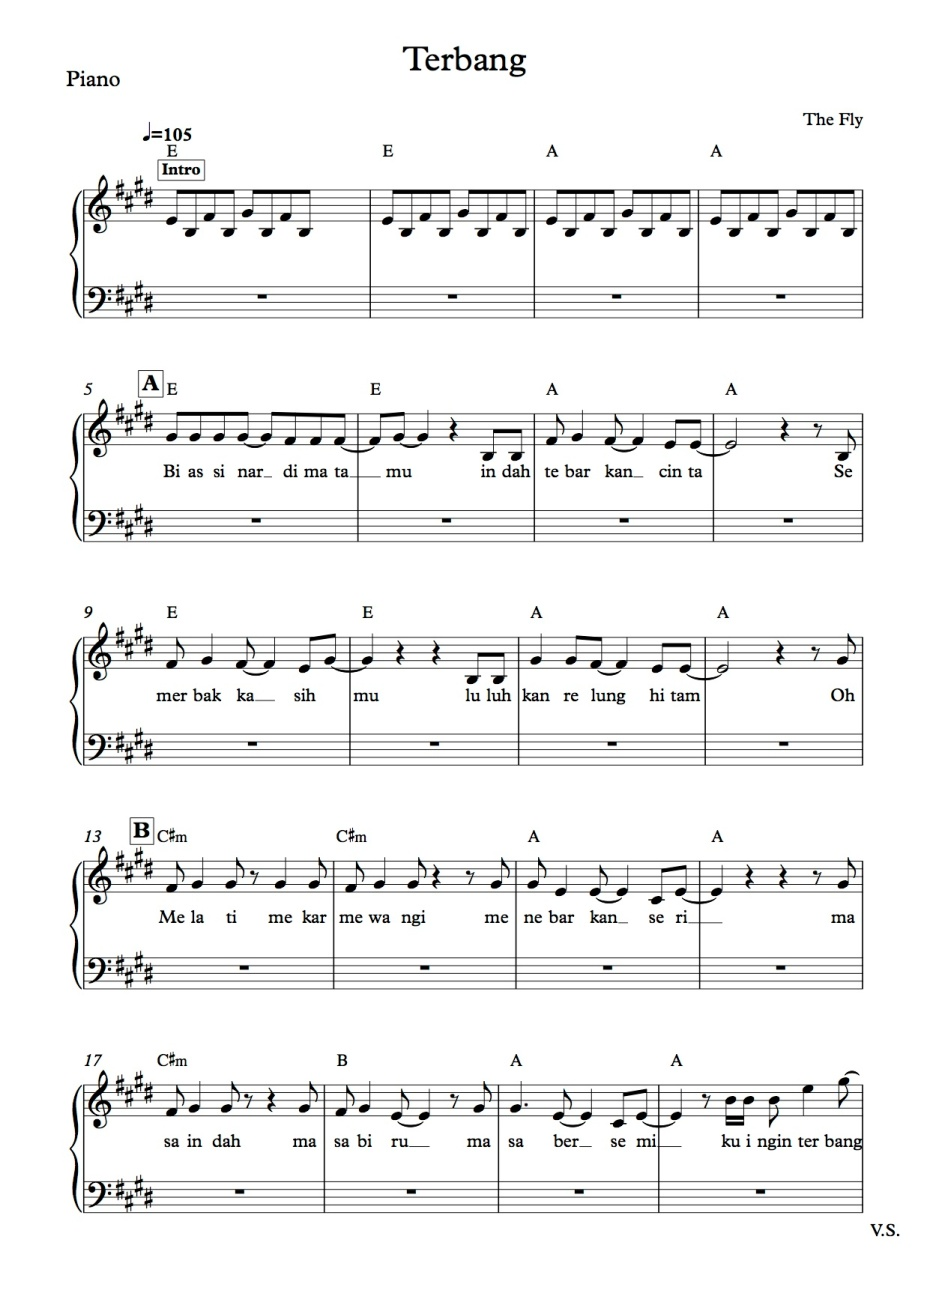 Transcribed